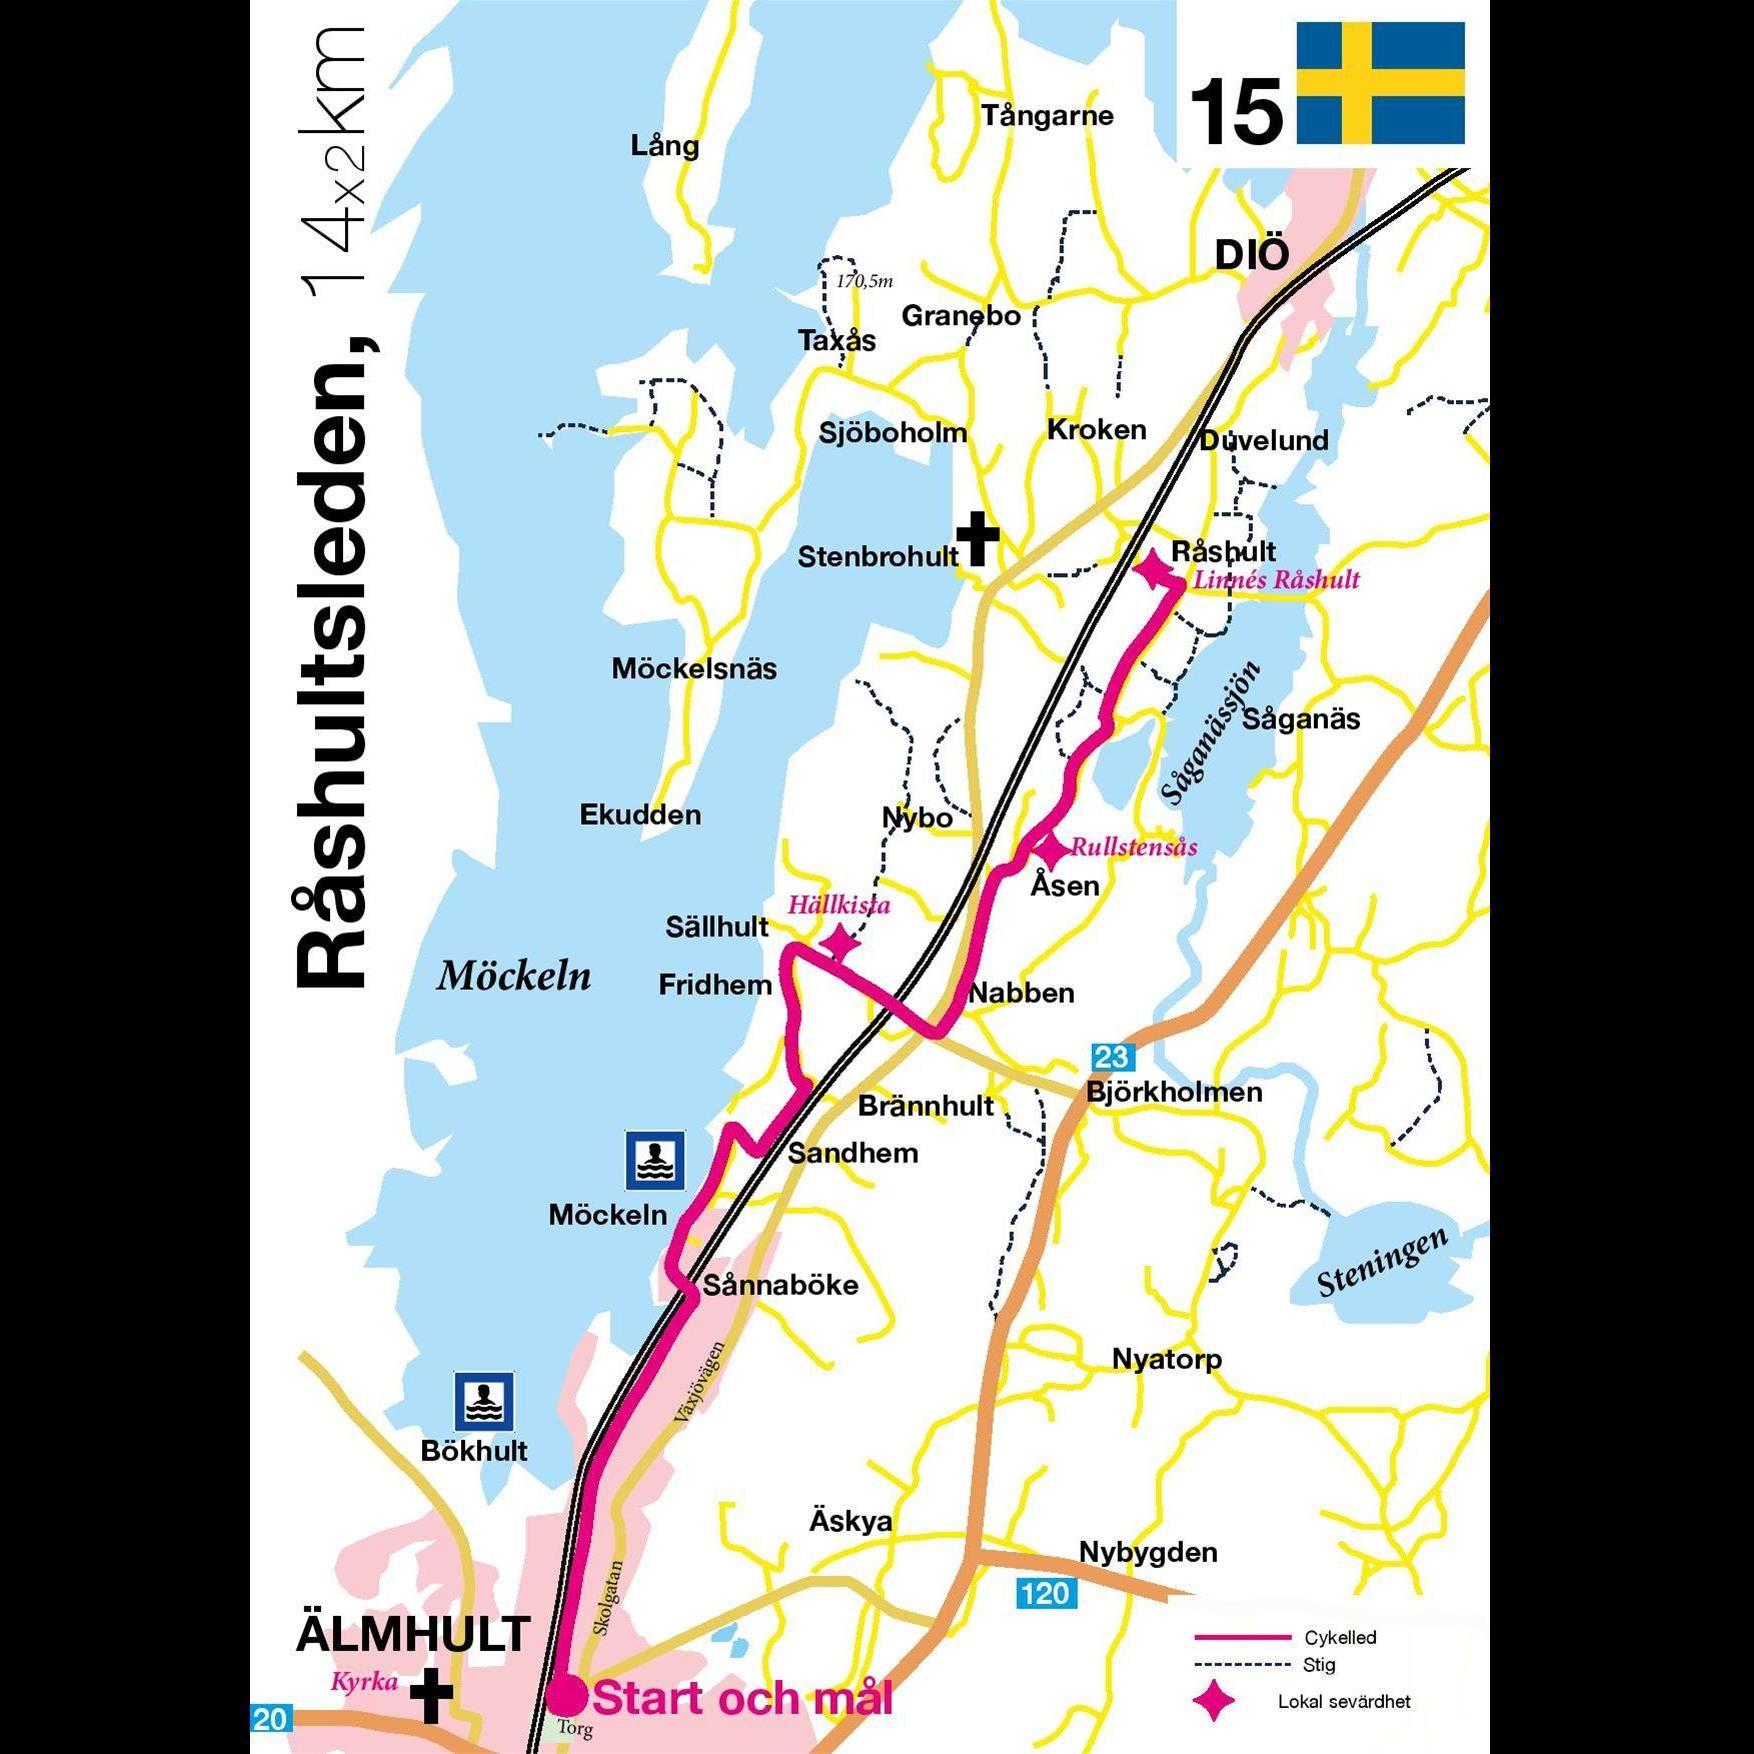 Bicycle tour - The Råshult Tour - 14x2 km